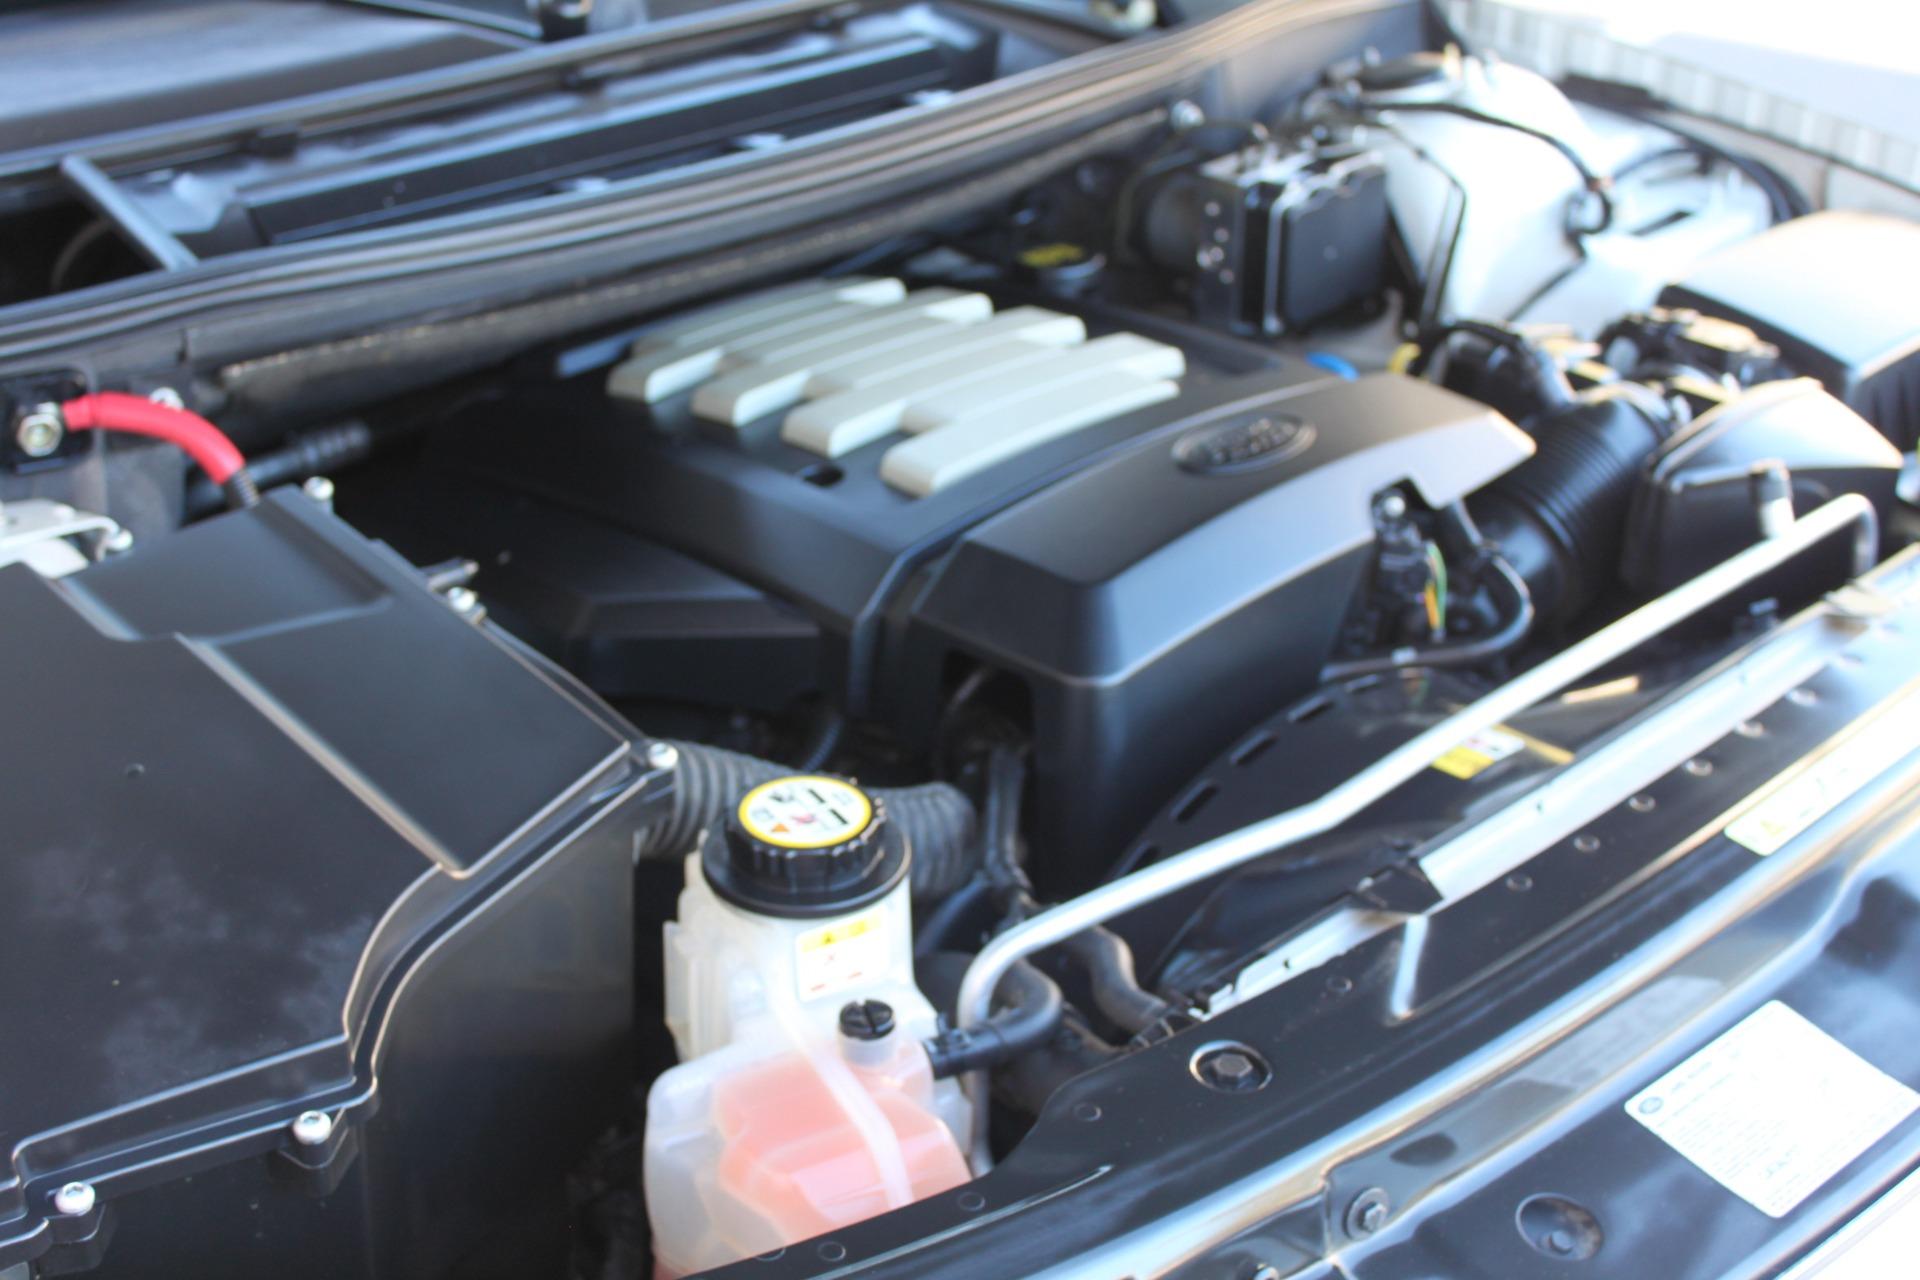 Used-2007-Land-Rover-Range-Rover-HSE-Land-Cruiser